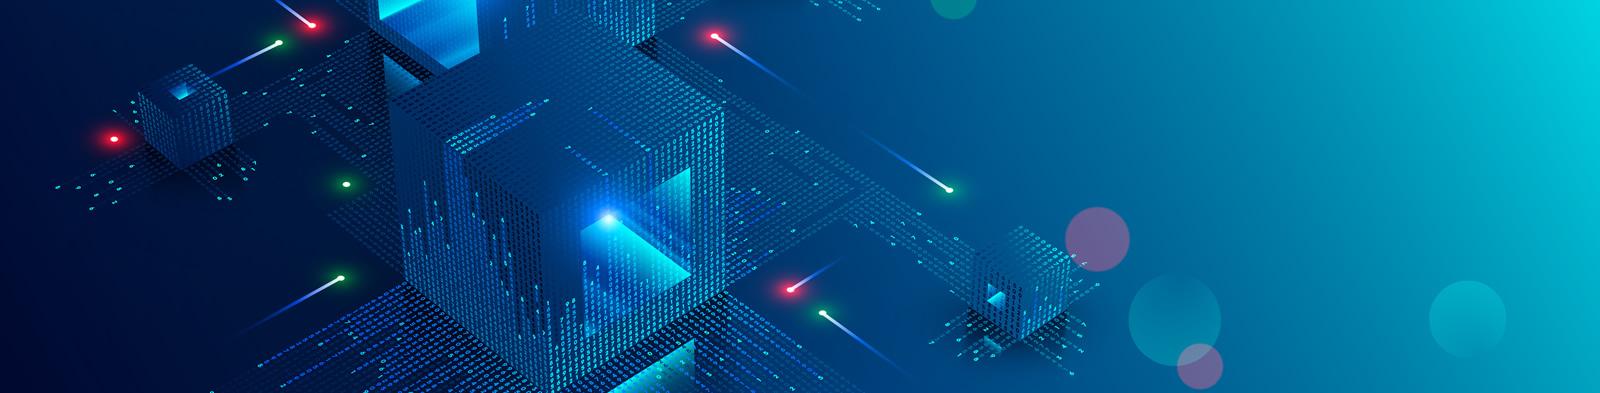 Graphic of blockchain technology